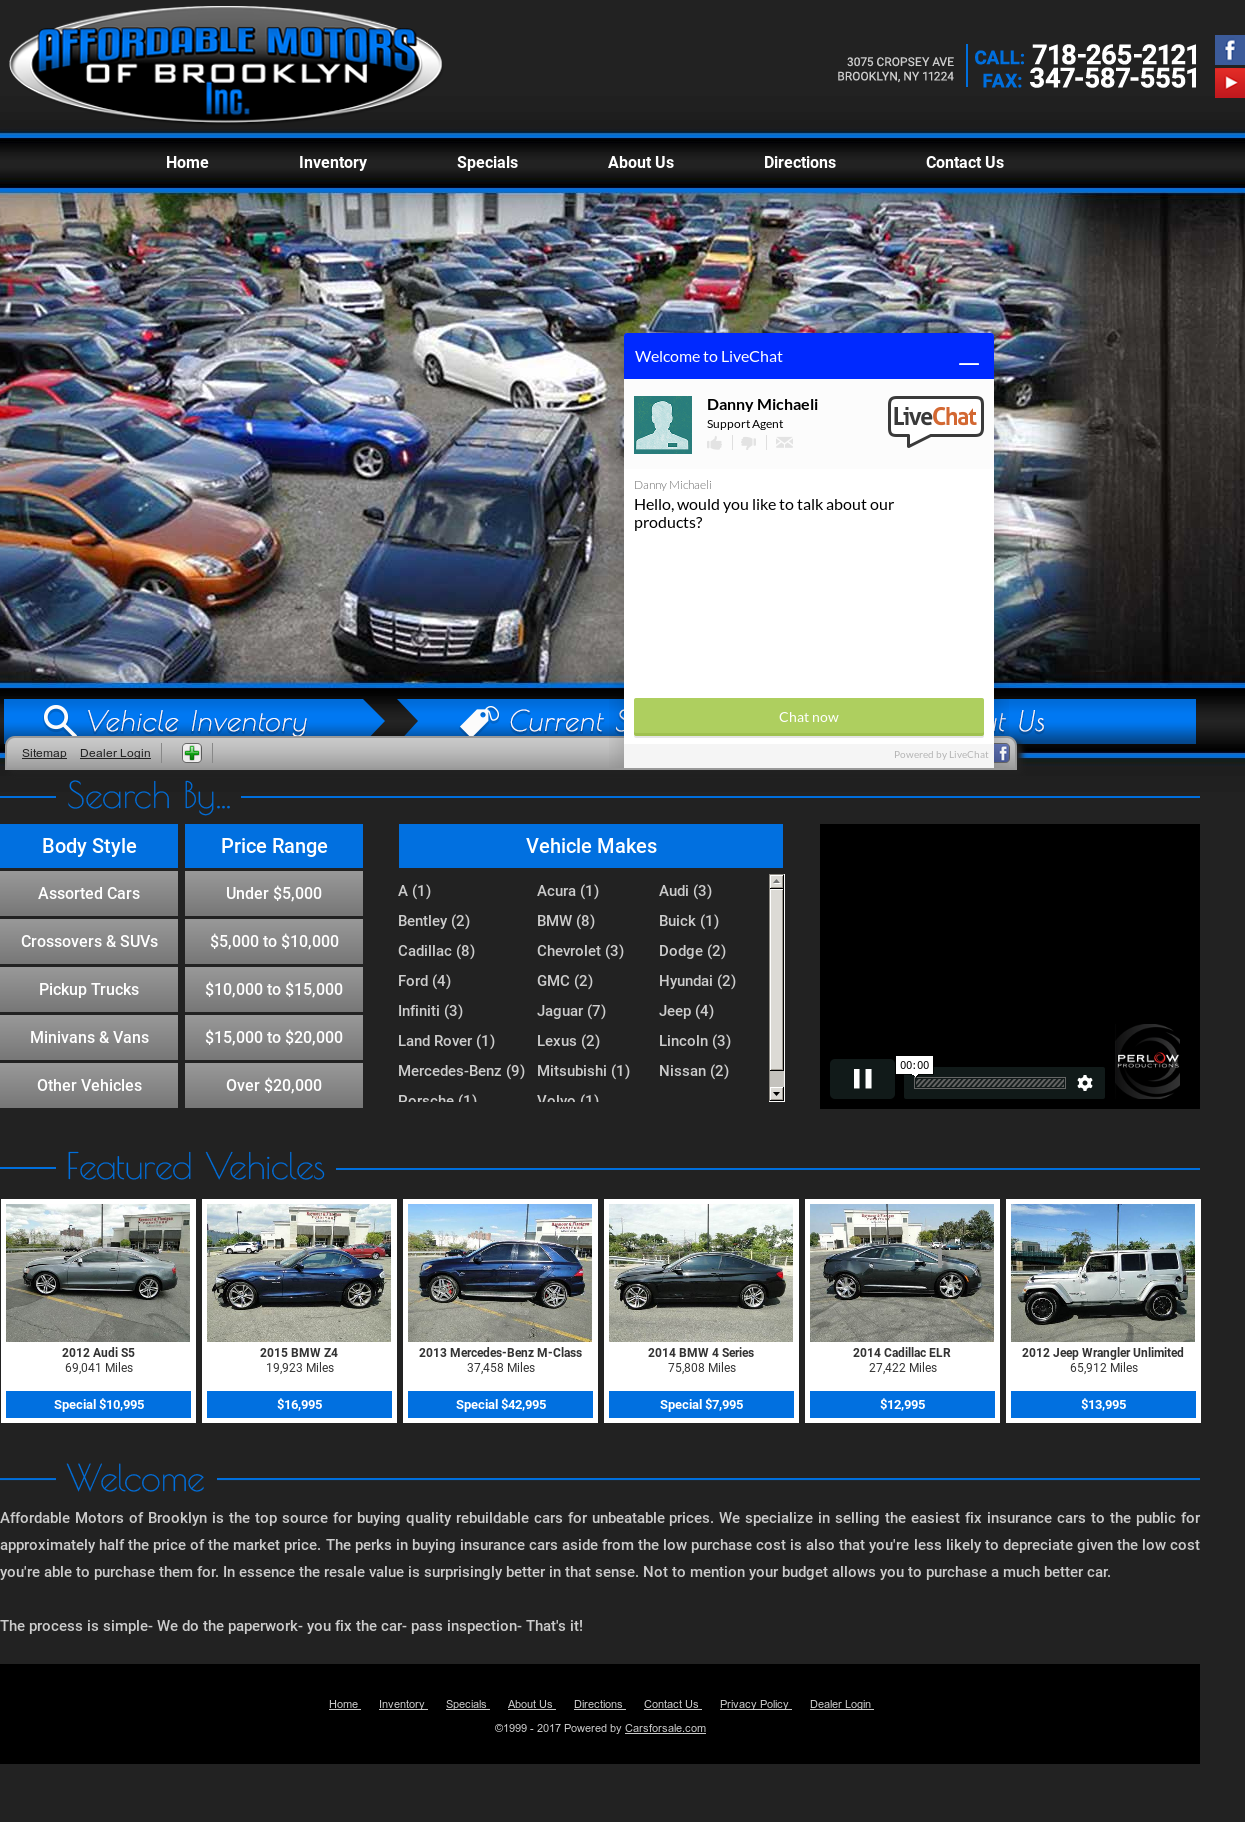 Affordable Motors of Brooklyn website history